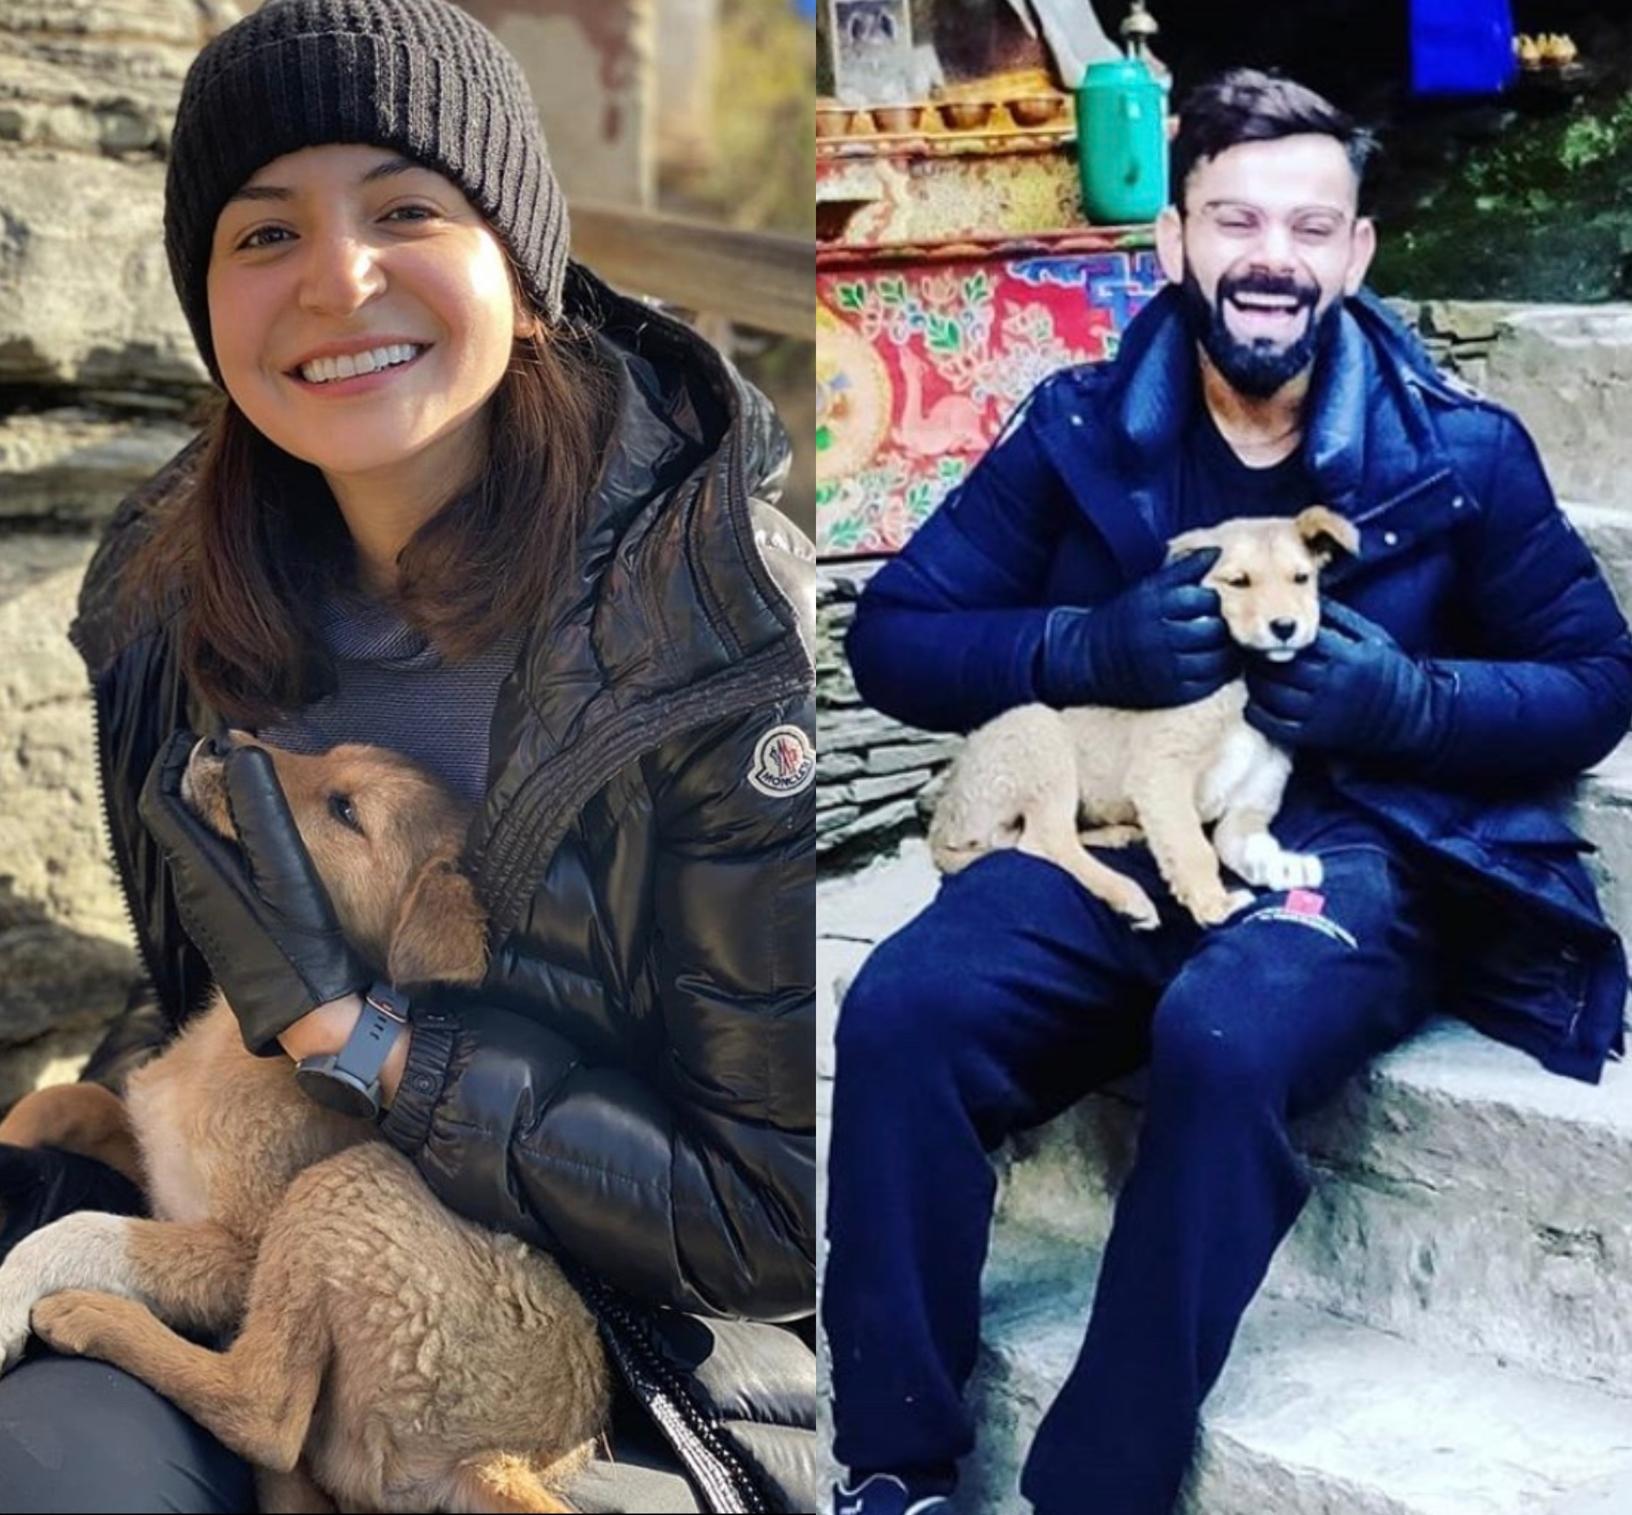 Anushka Sharma And Virat Kohli's Love For Animals Melts Everyone's Hearts